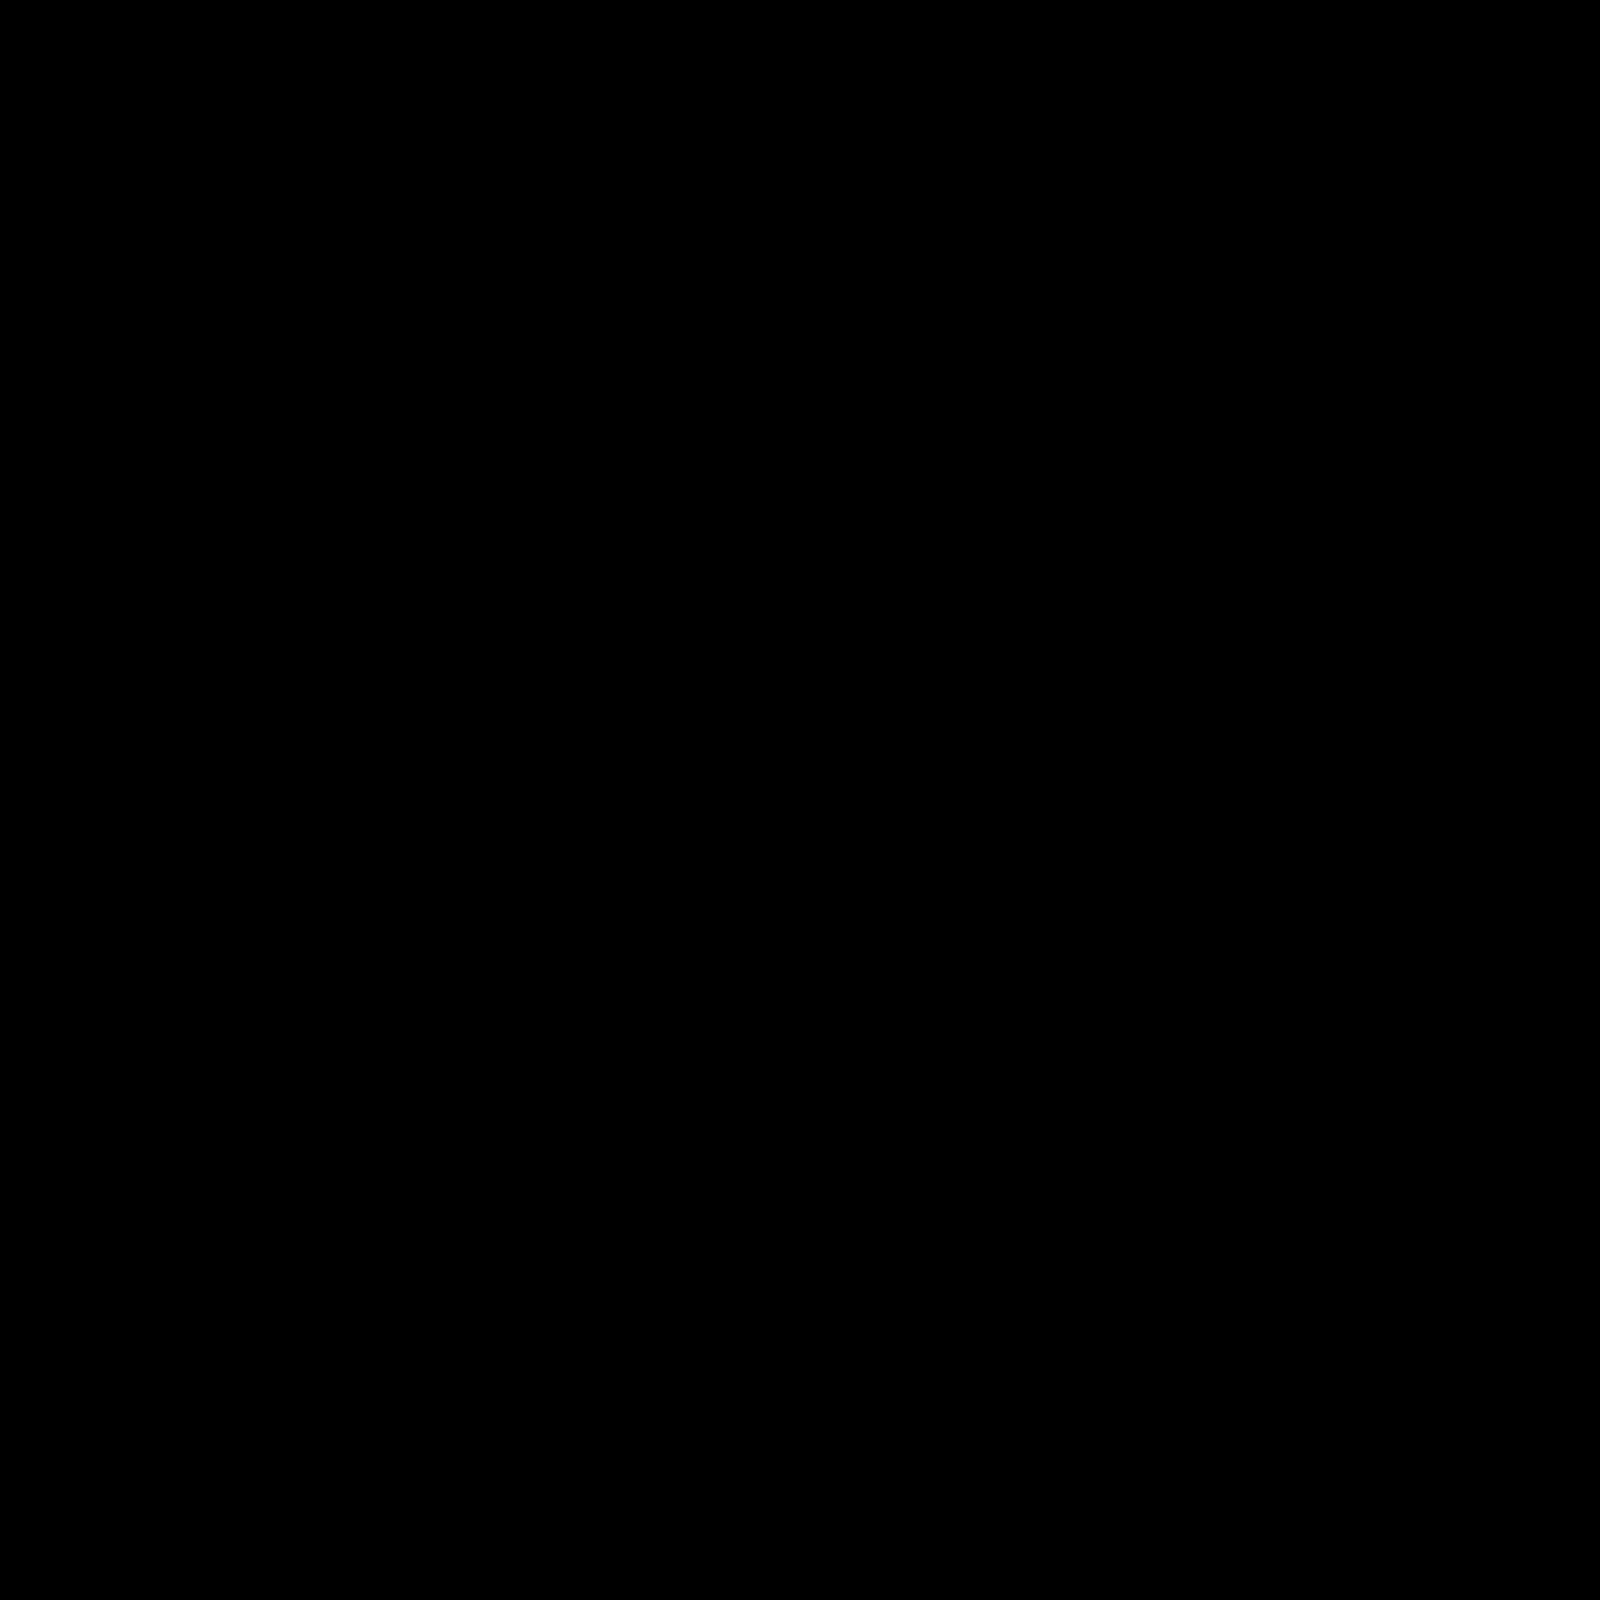 Hooli icon